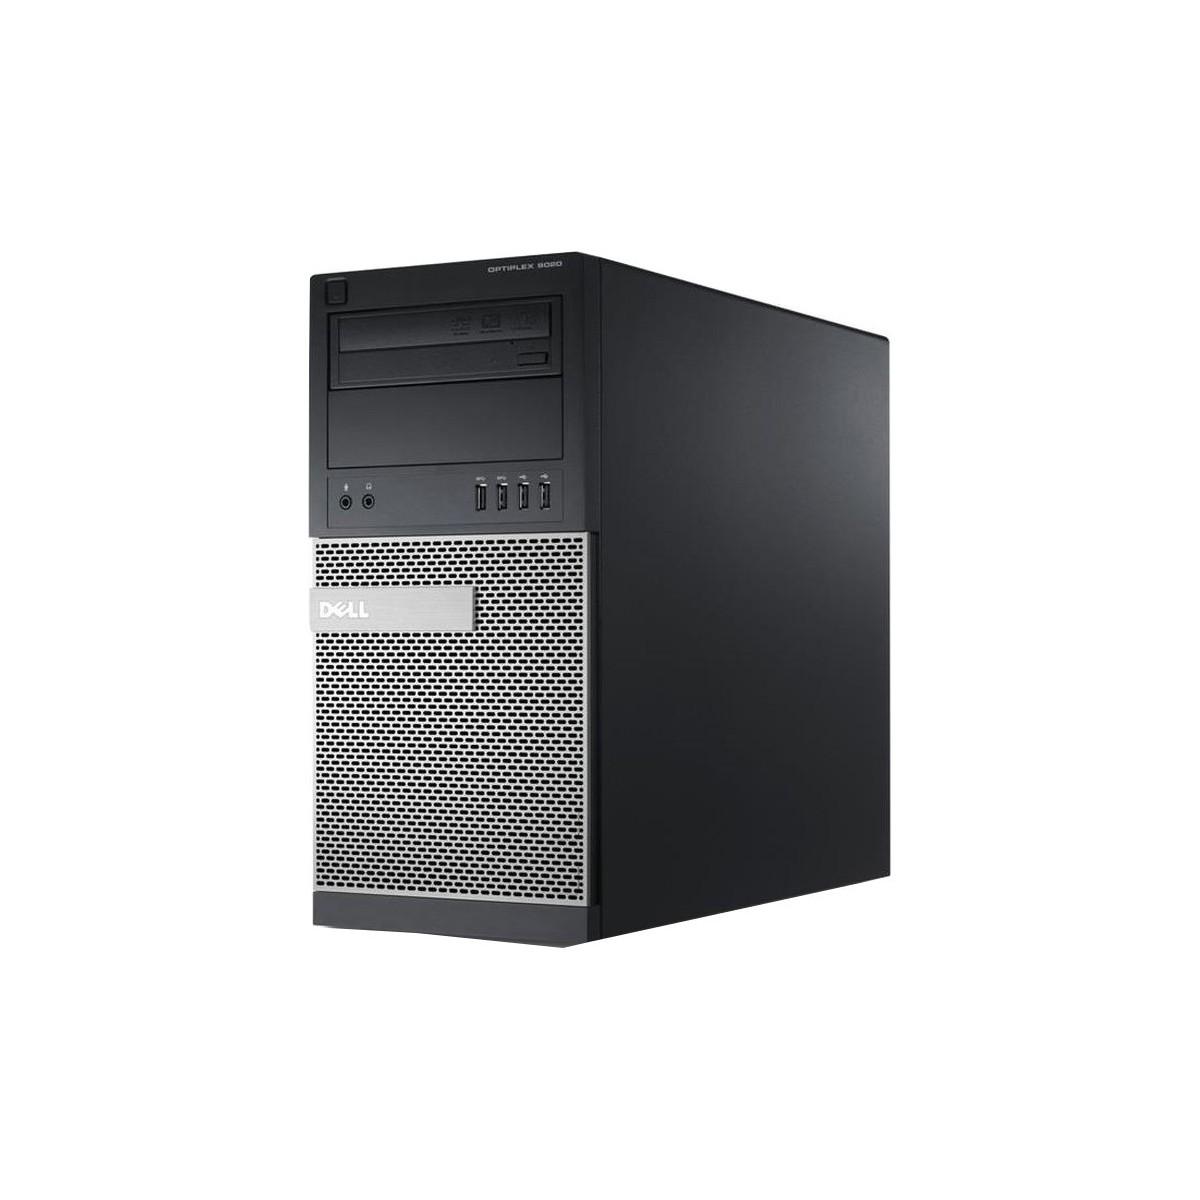 DELL 9020 MT i7-4790 16GB 128GB SSD 500GB HDD W10